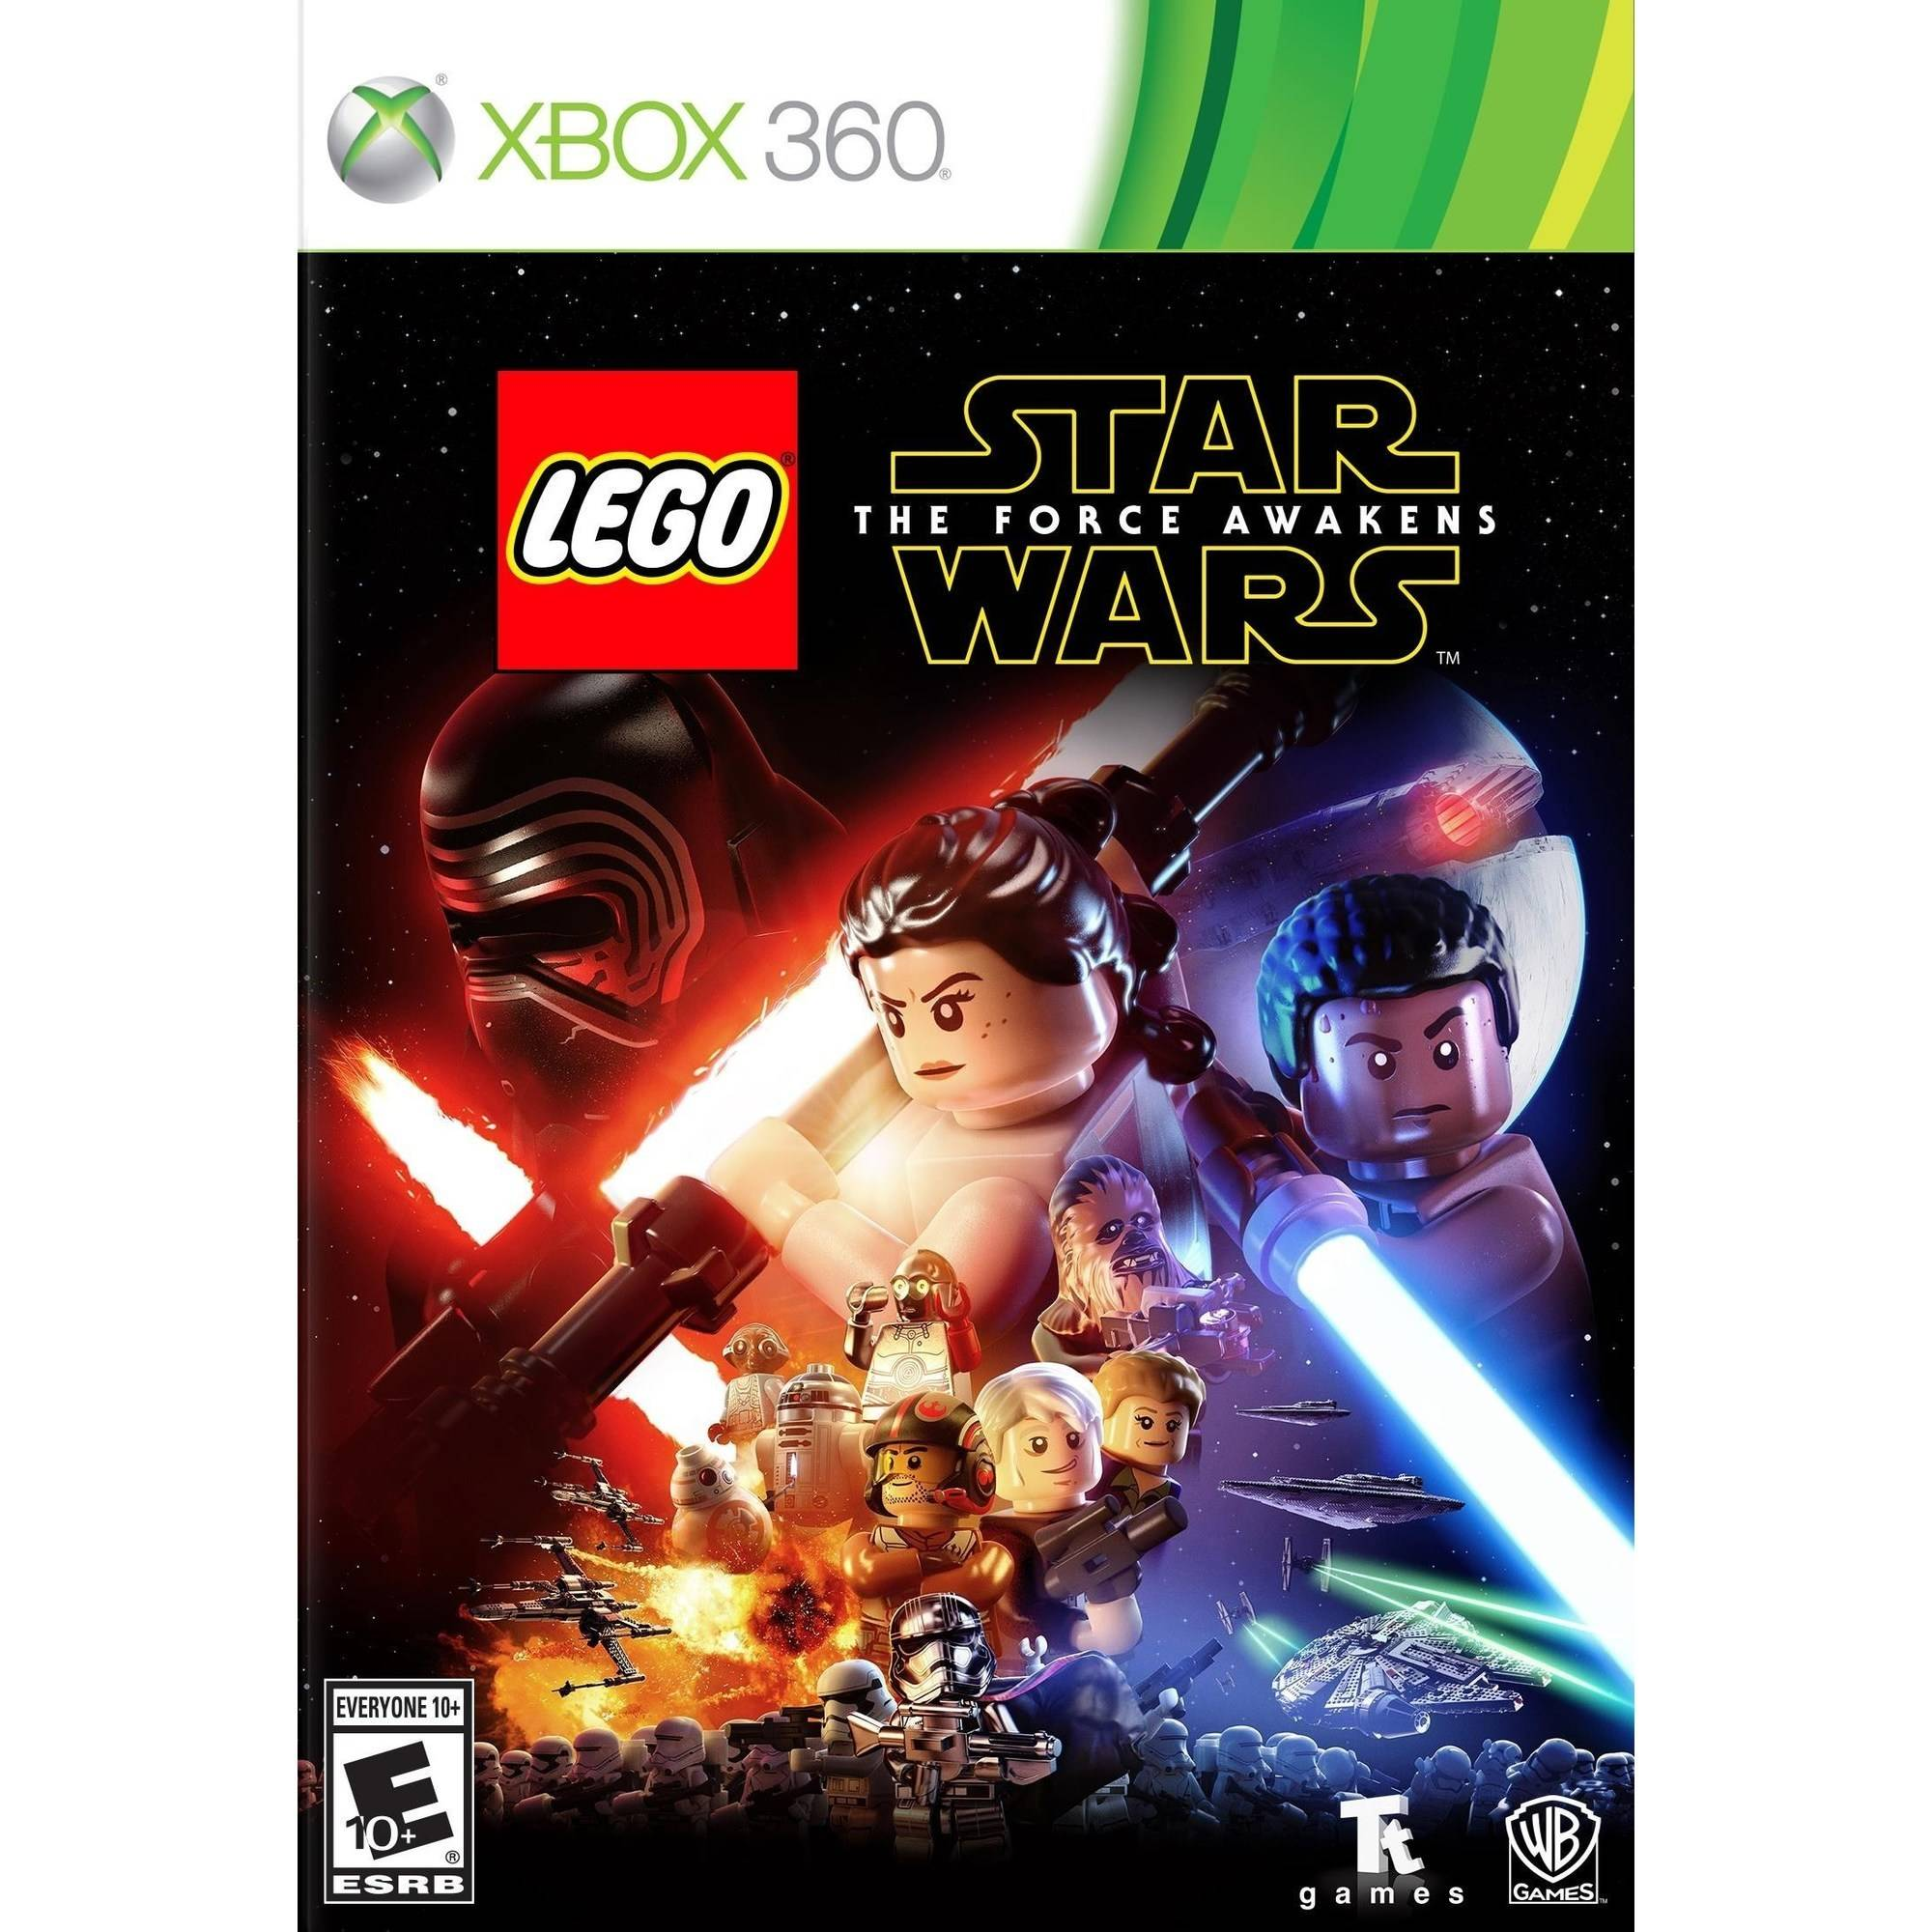 LEGO Star Wars The Force Awakens (Xbox 360)